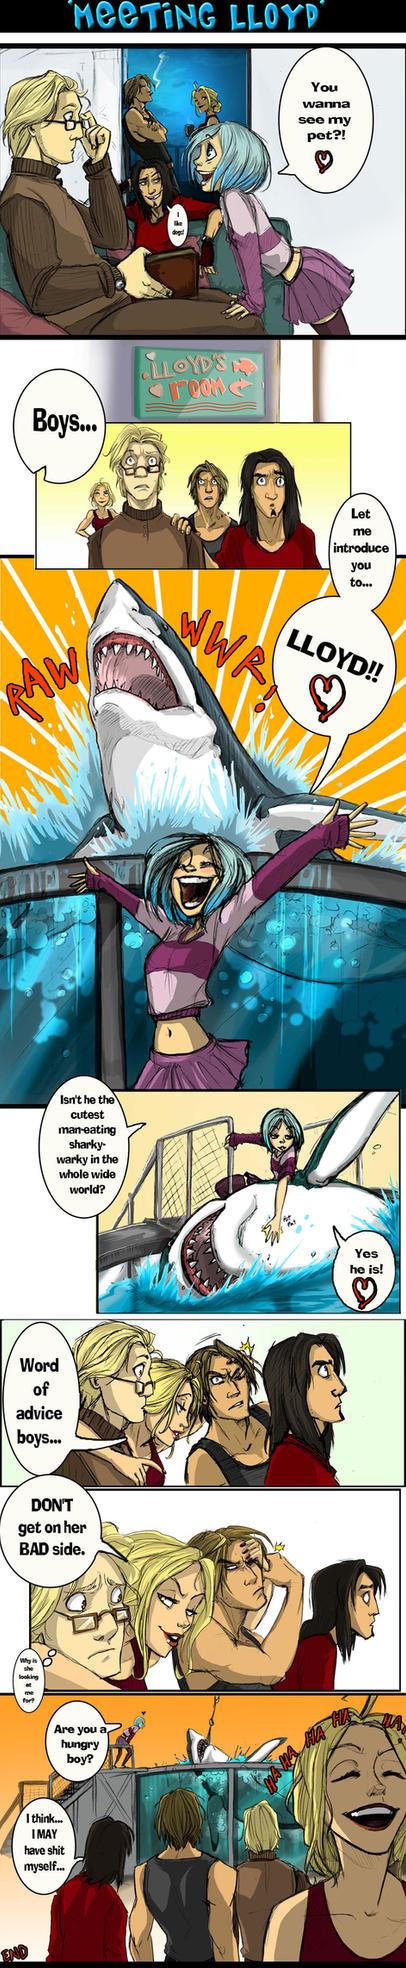 Elements comic- Meeting Lloyd by ElementJax